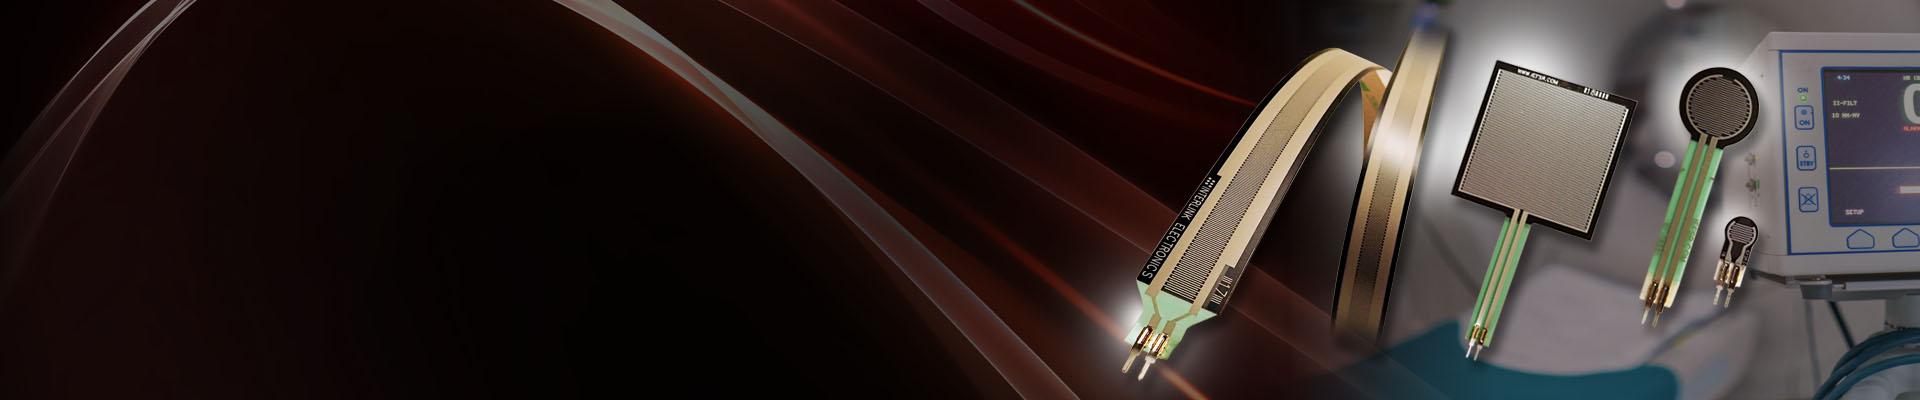 FSR X™ & FSR UX™ Next-Generation Force Sensing Resistors